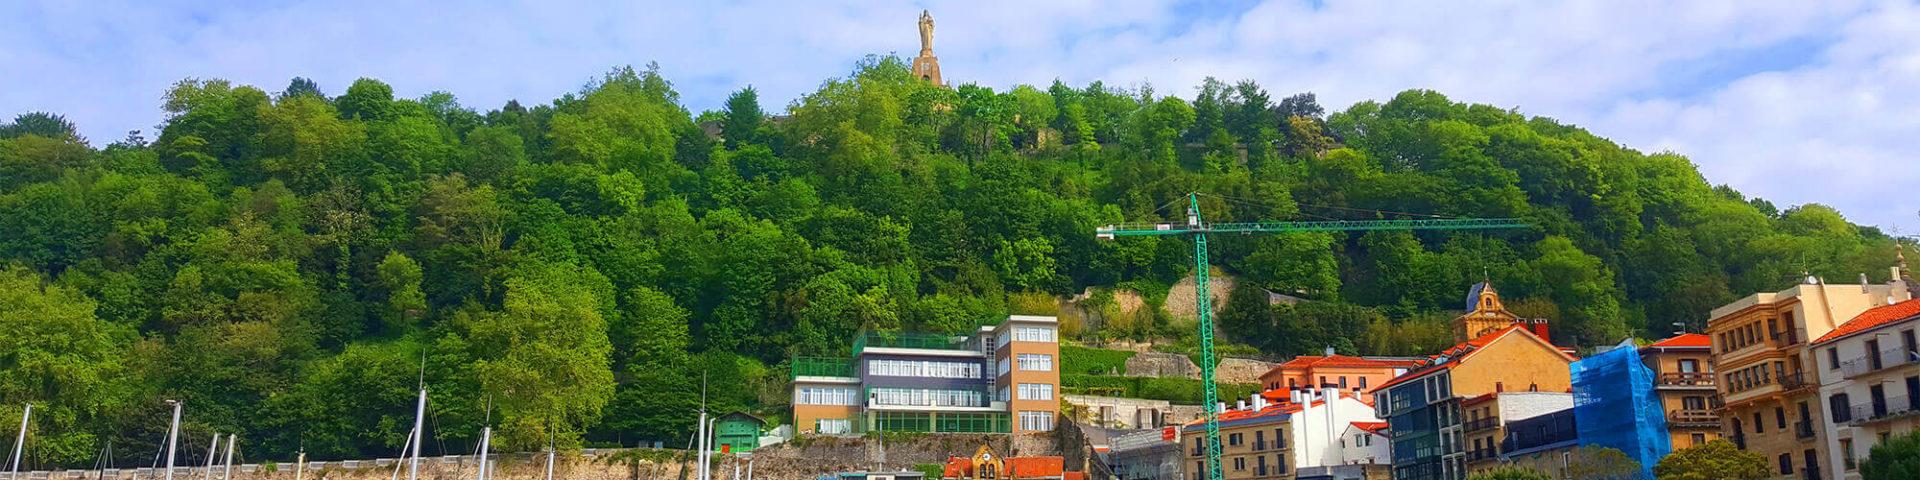 Monte Urgull & Jesus Christ Statue